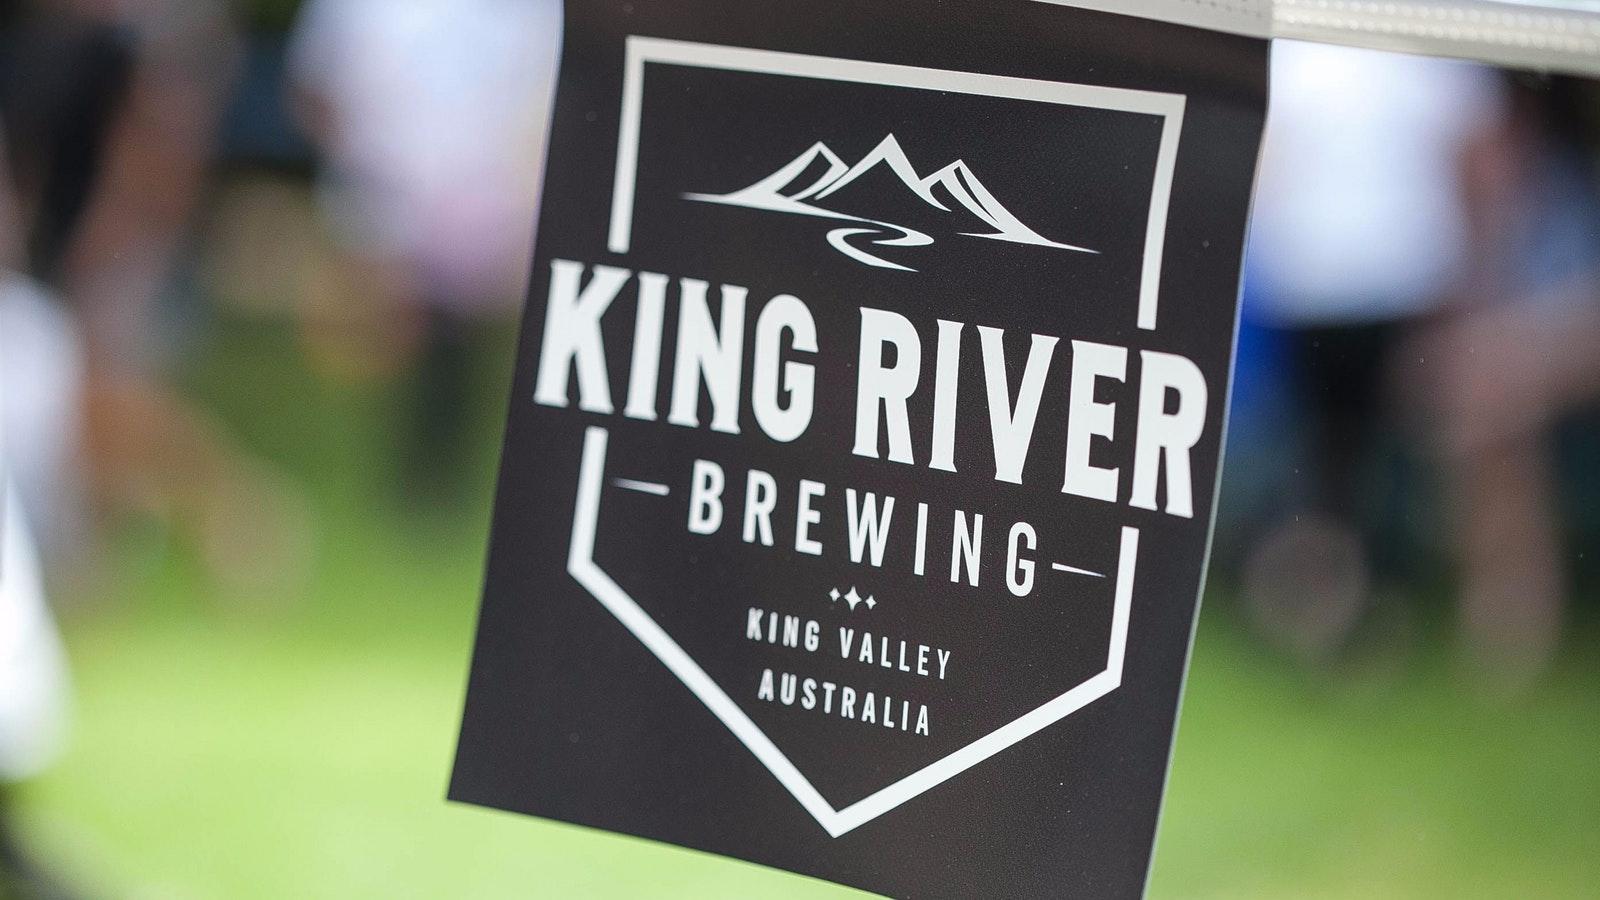 King River Brewing bunting